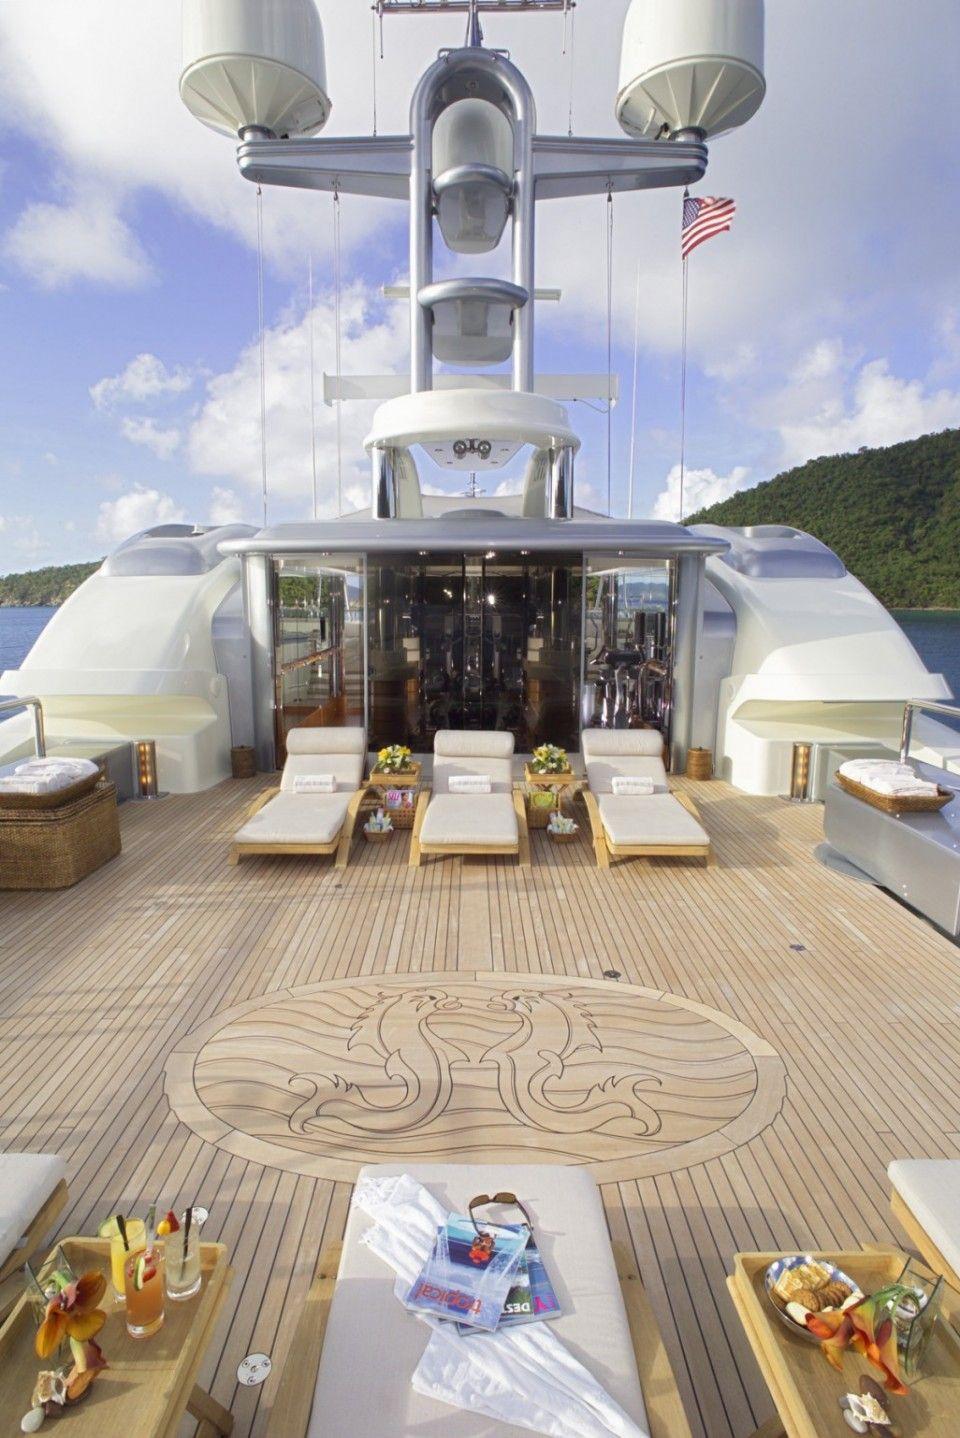 M Y Solemar 61m Amels Yacht Charter Luxury Yachts Yacht Interior Luxury Yacht Interior